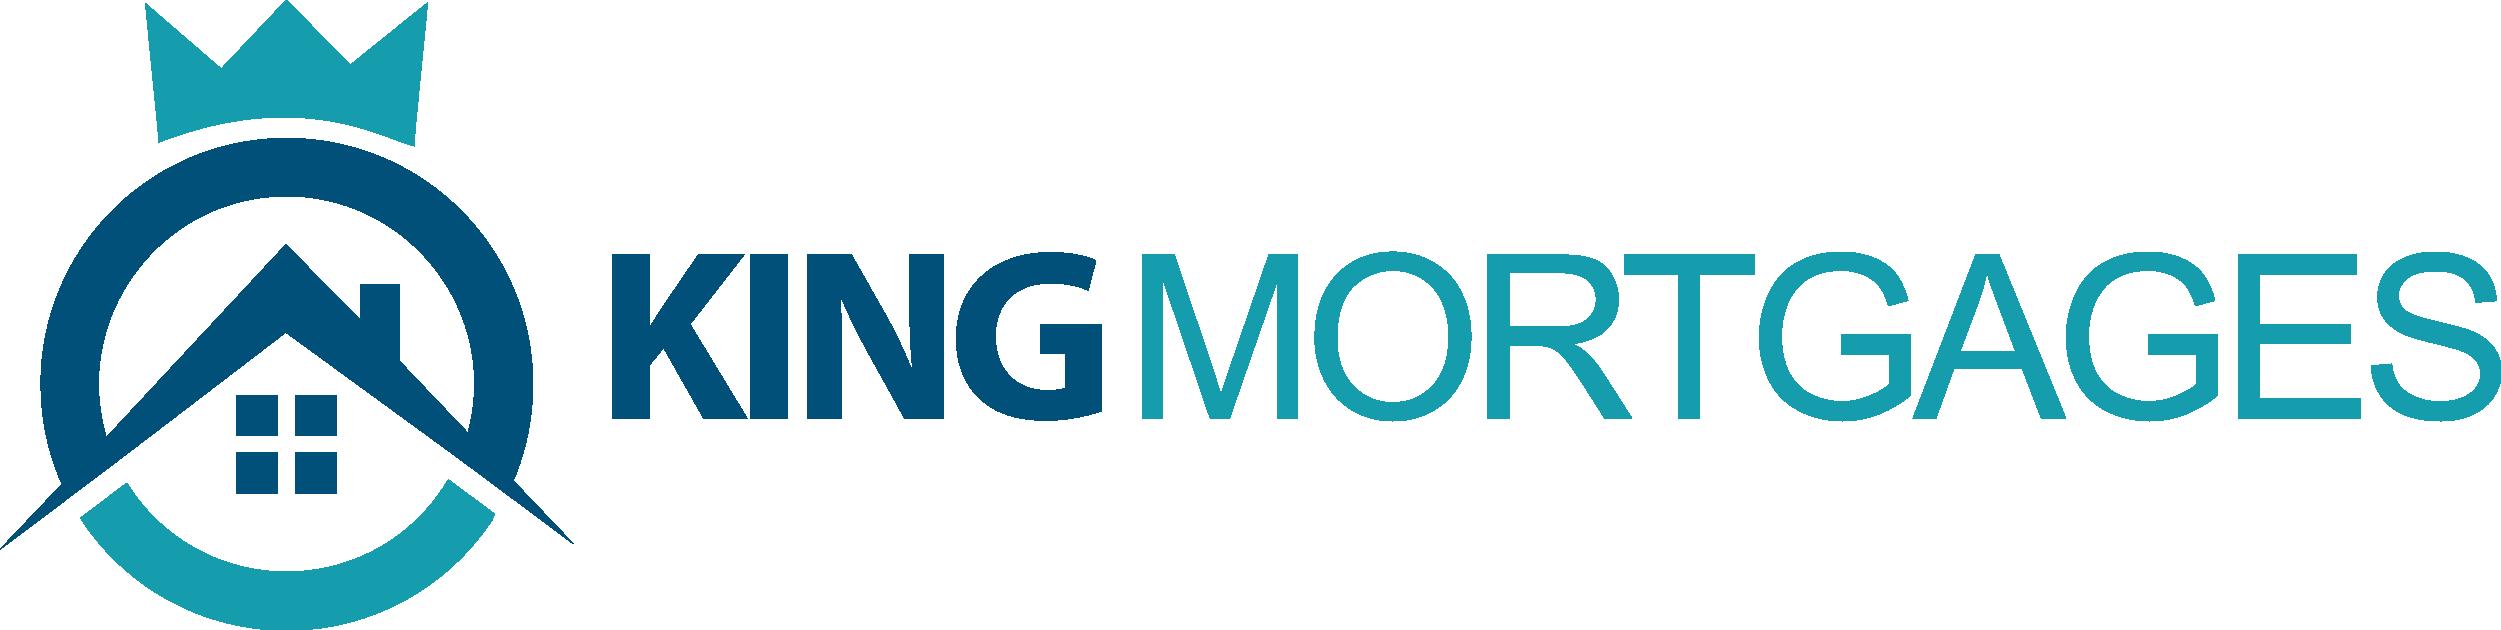 King Mortgages Ltd